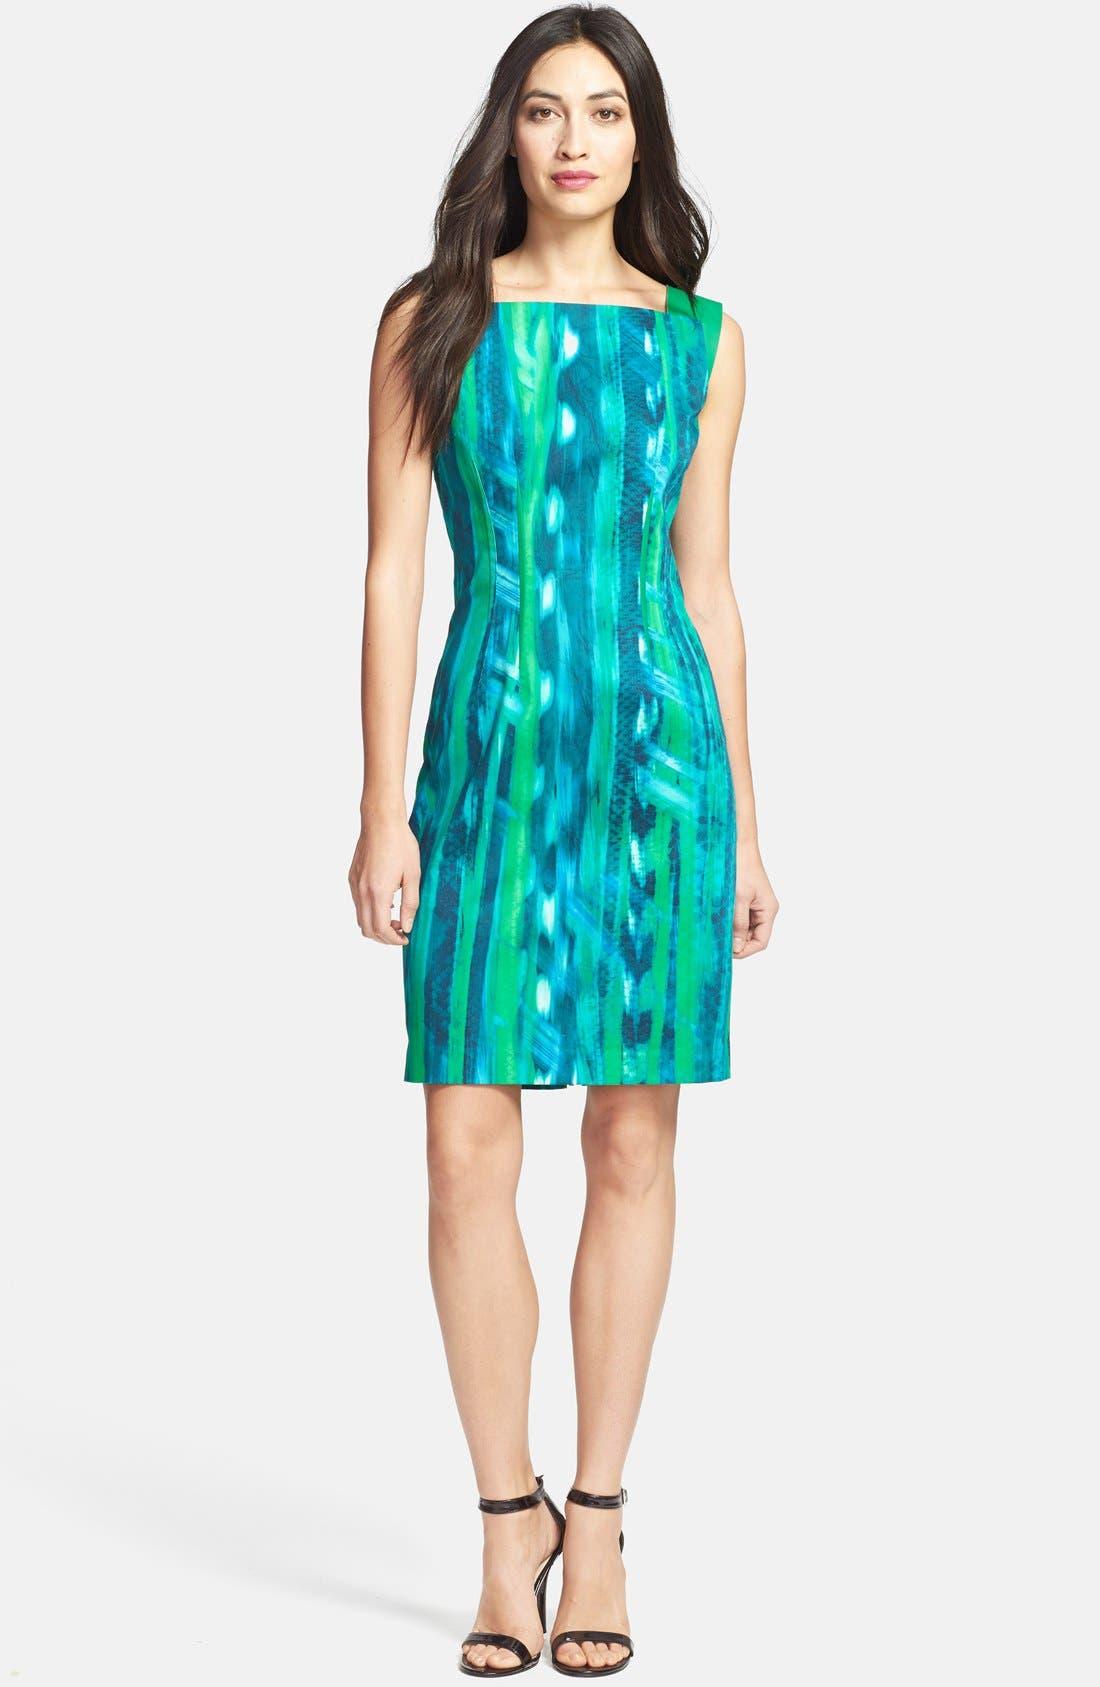 Alternate Image 1 Selected - Elie Tahari 'David' Square Neck Sheath Dress